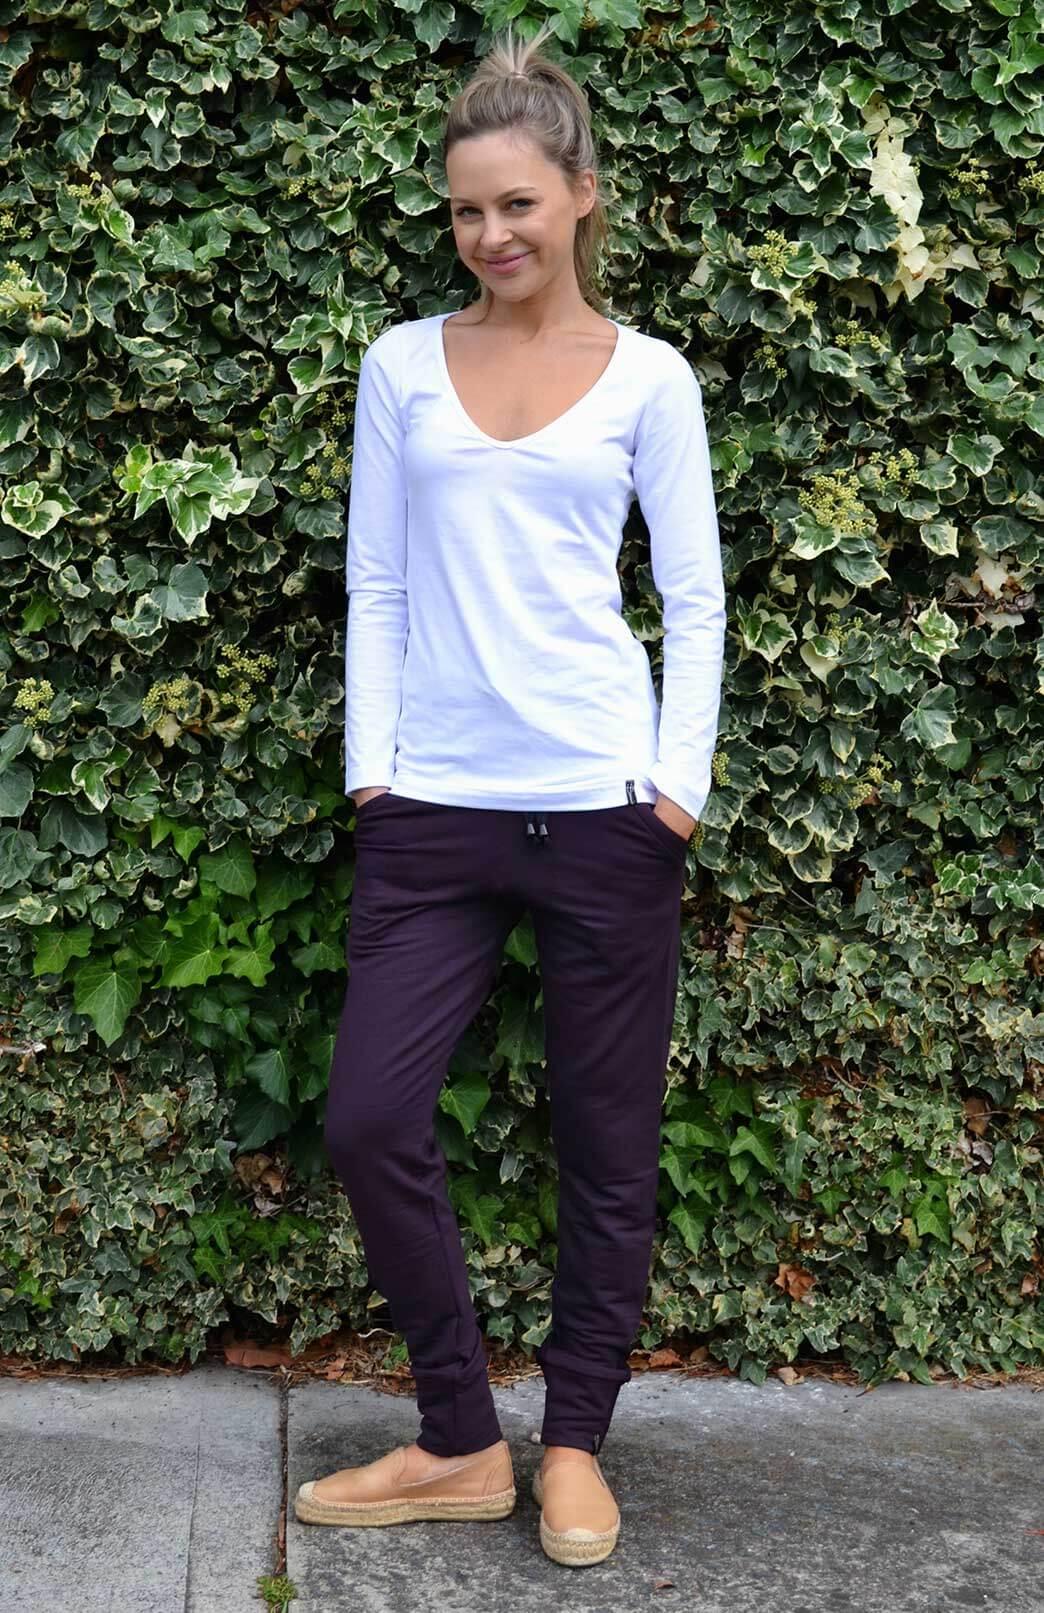 Lounge Pants - Fleece - Women's Purple Fleece Lined Wool Jogger Track pants - Smitten Merino Tasmania Australia